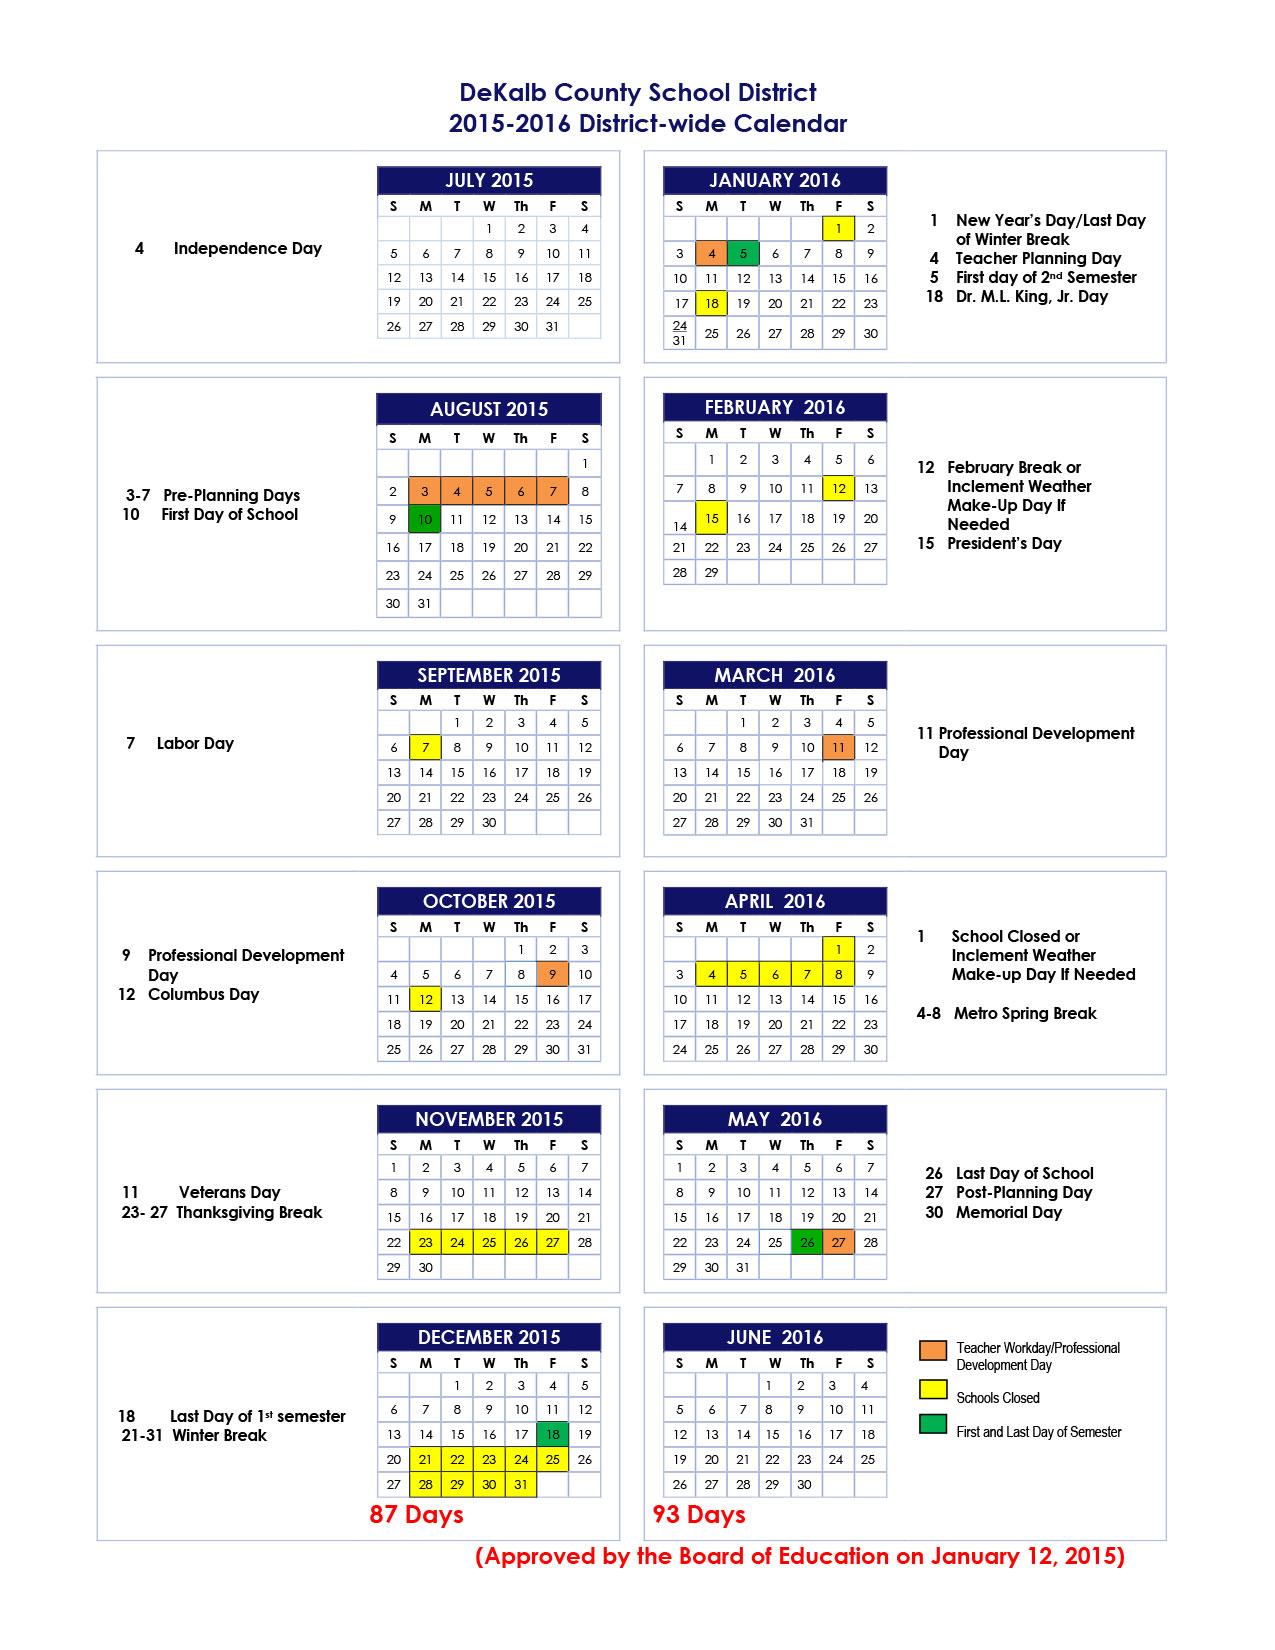 Yangah Solen: Nyc Doe Calendar regarding 2015 Doe School ...